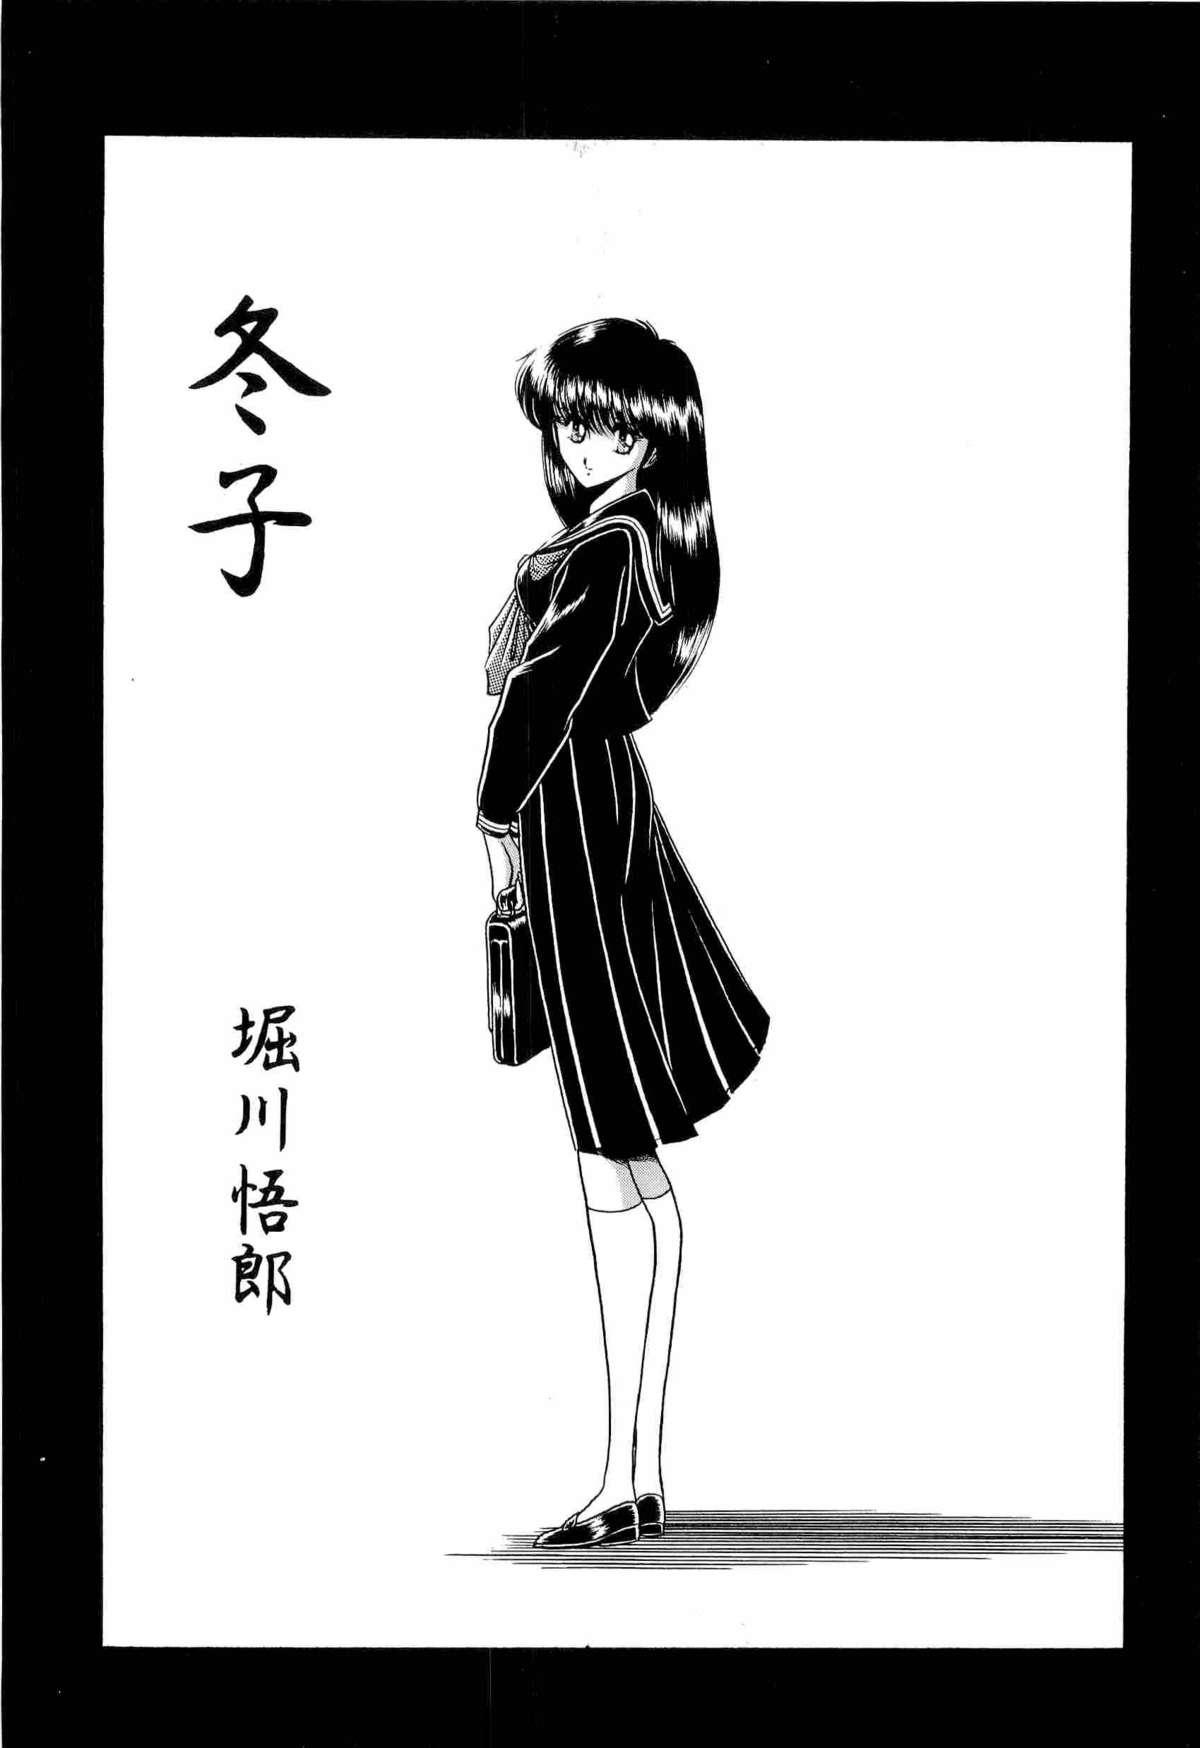 Bisyoujo Anthology '93 jyoukan 70